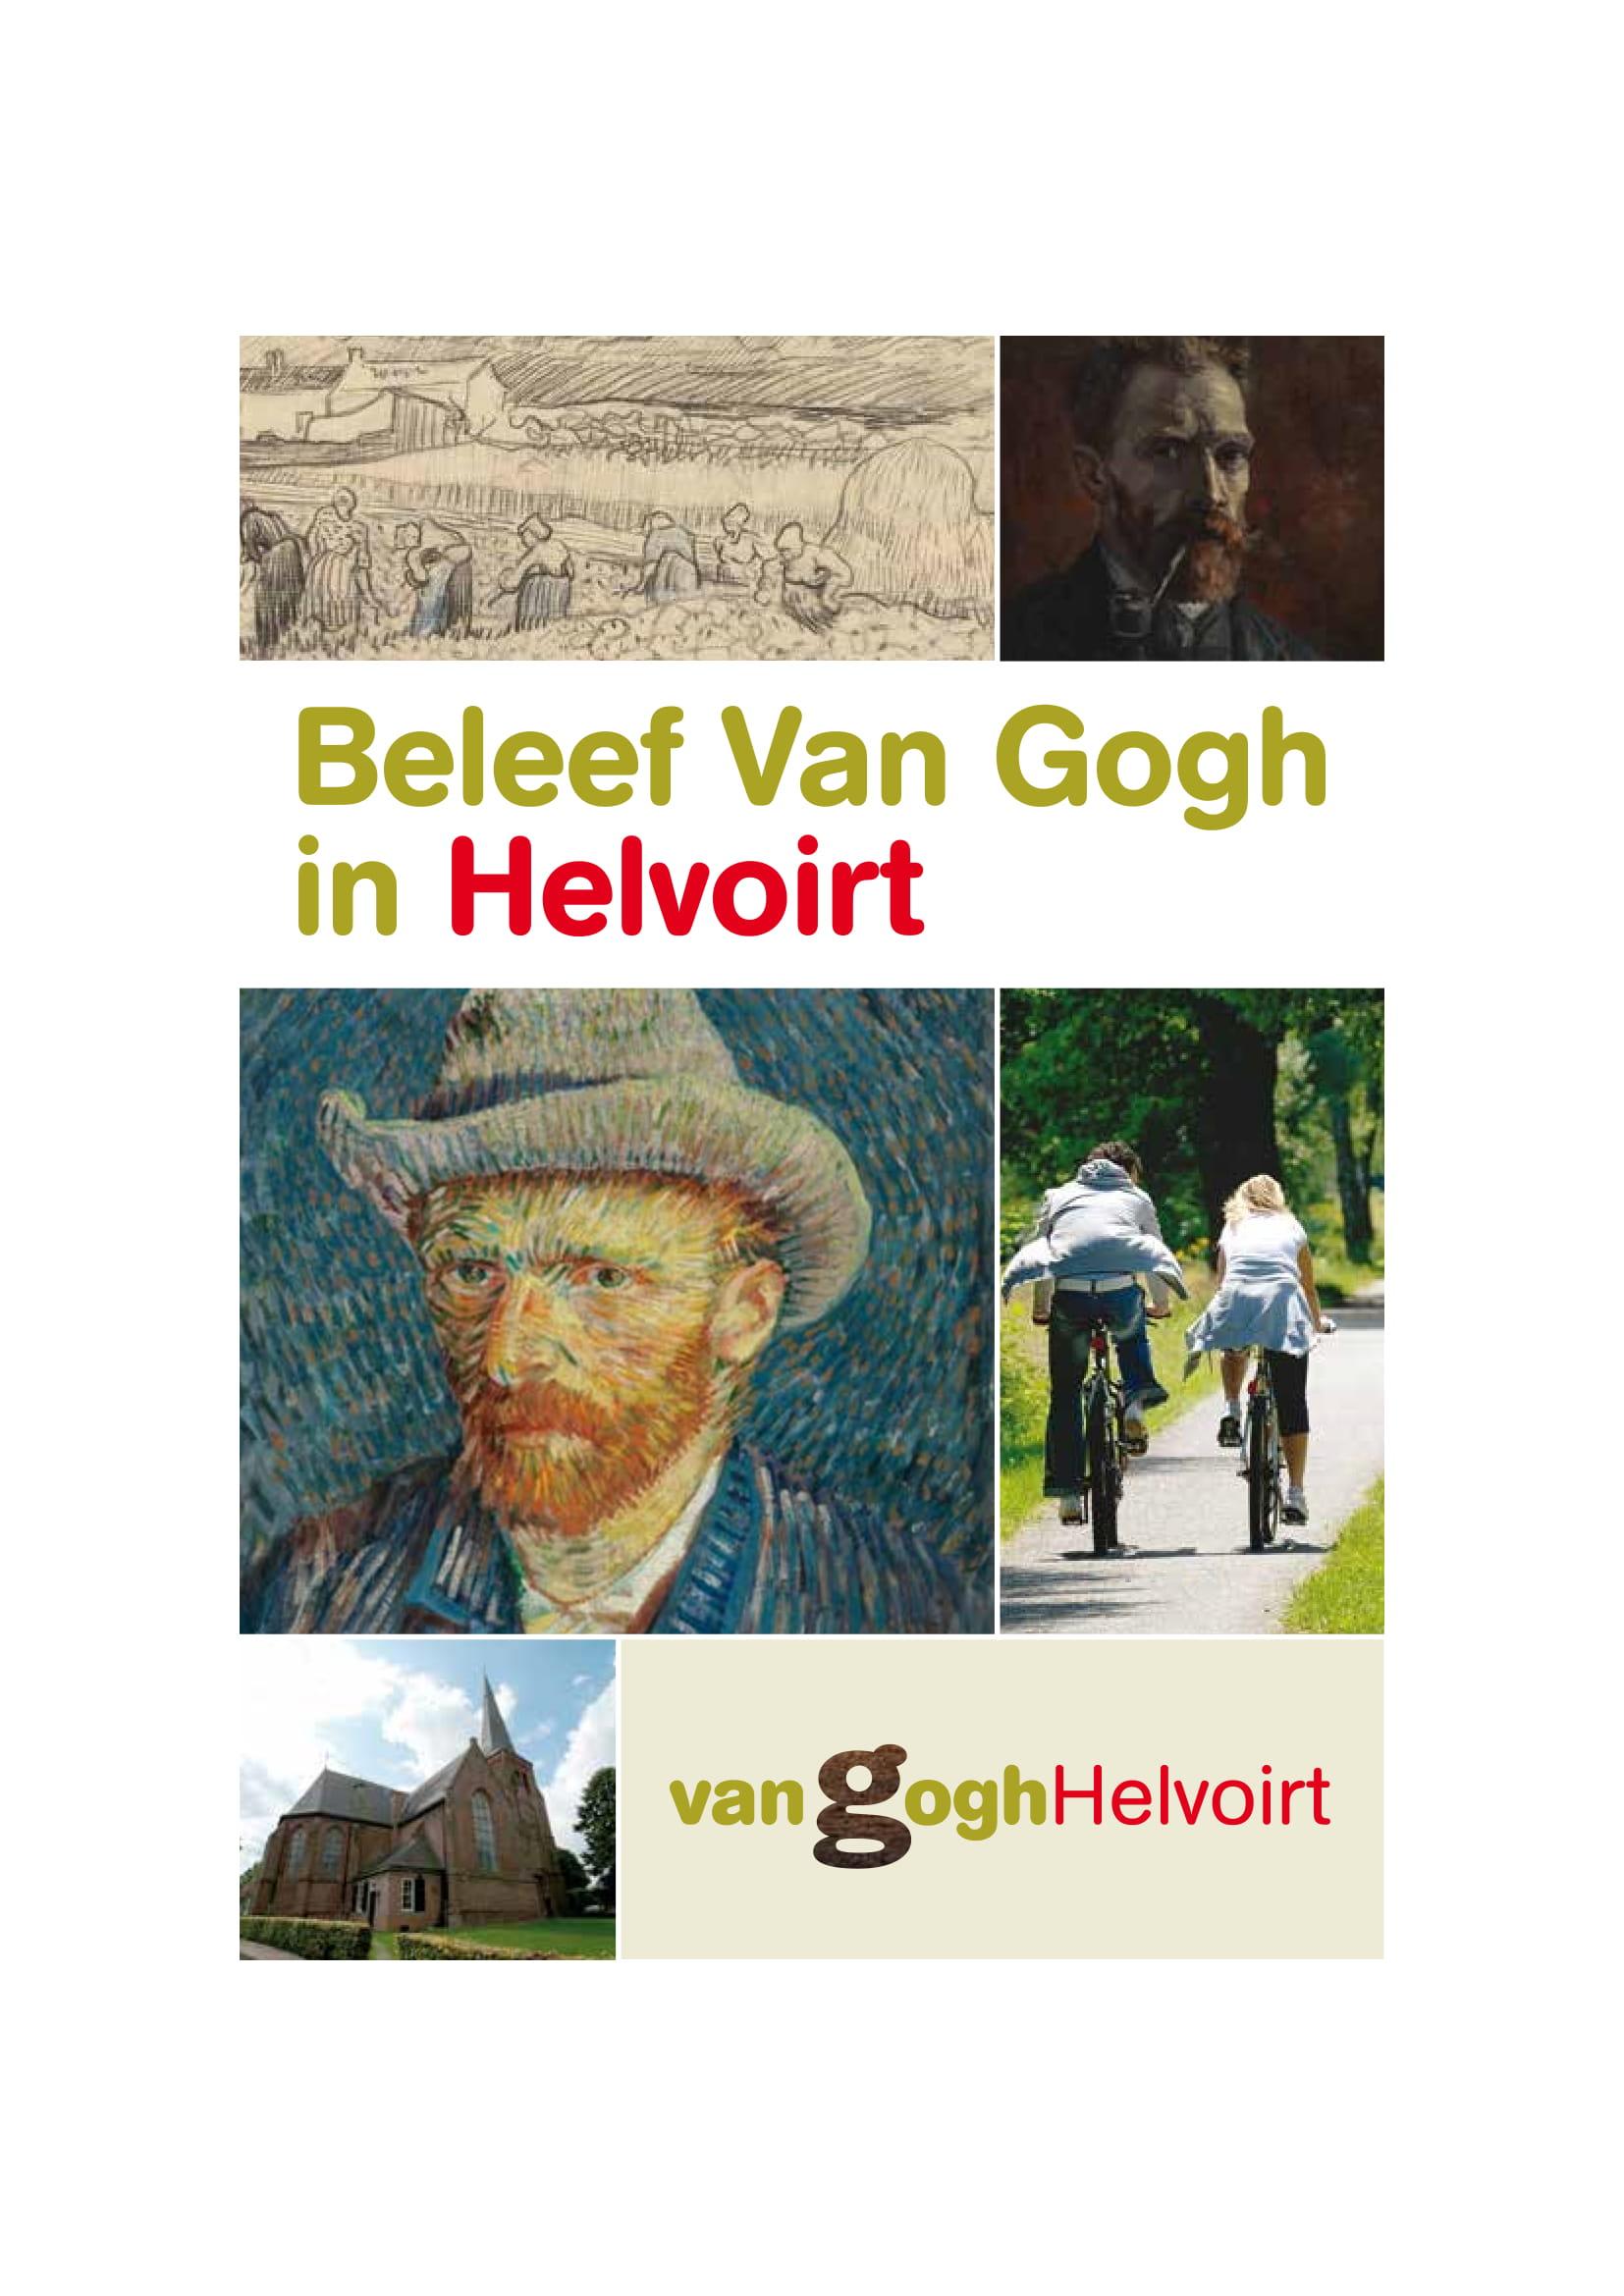 Brochure Van Gogh Helvoirt